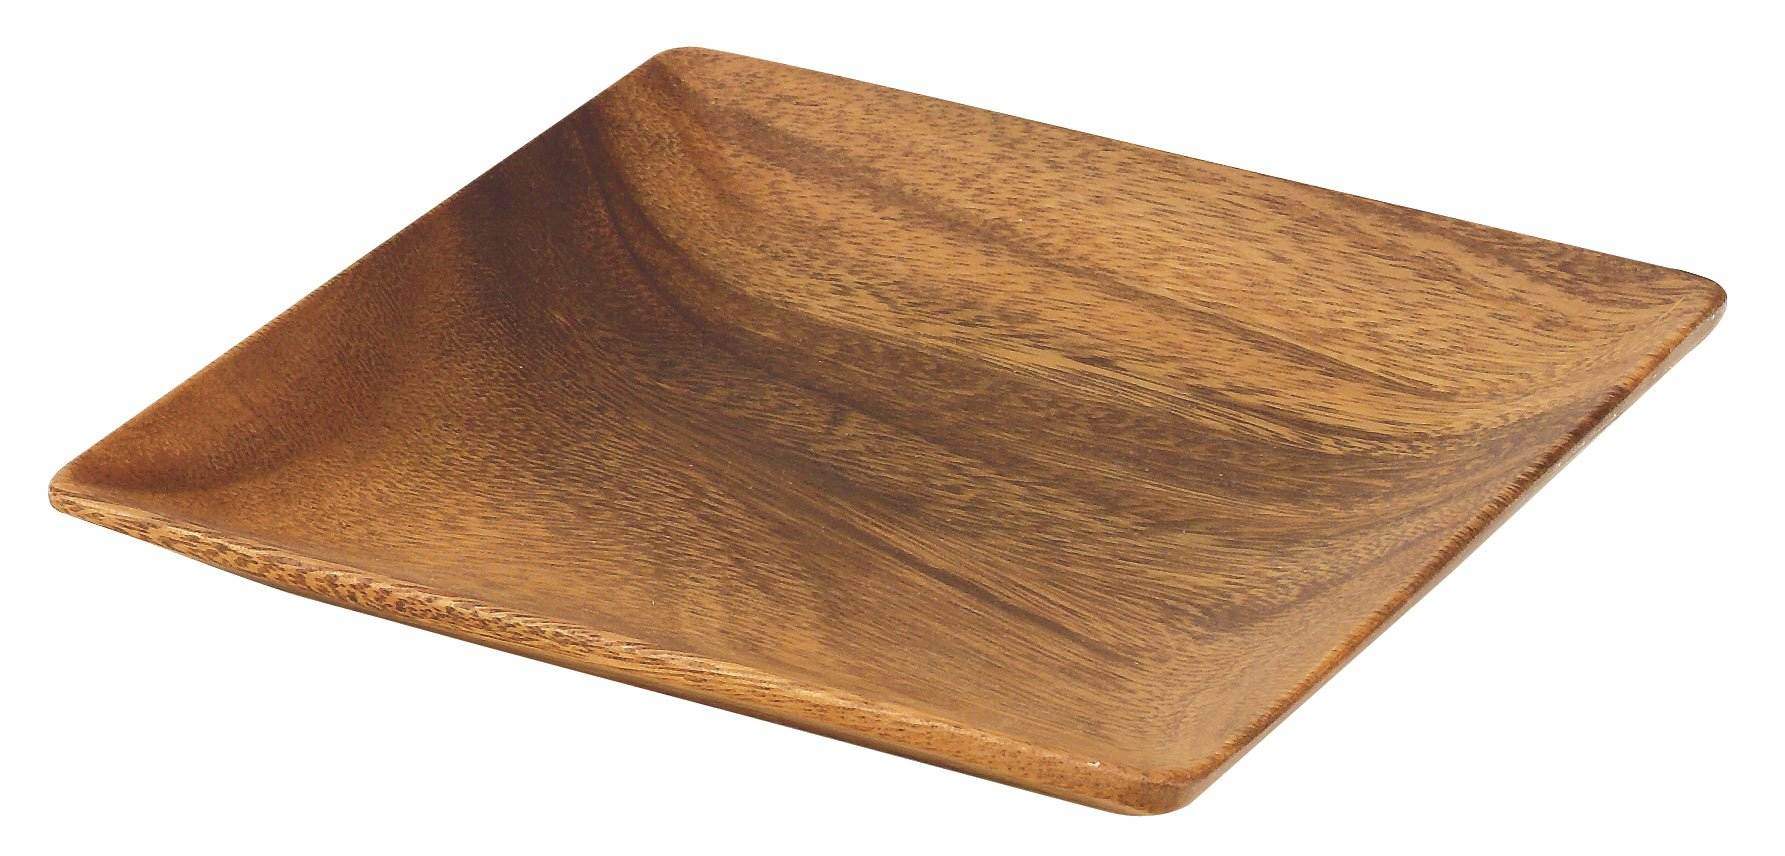 Pacific Merchants K0051 Acaciaware 7-Inch Acacia Wood Square Plate